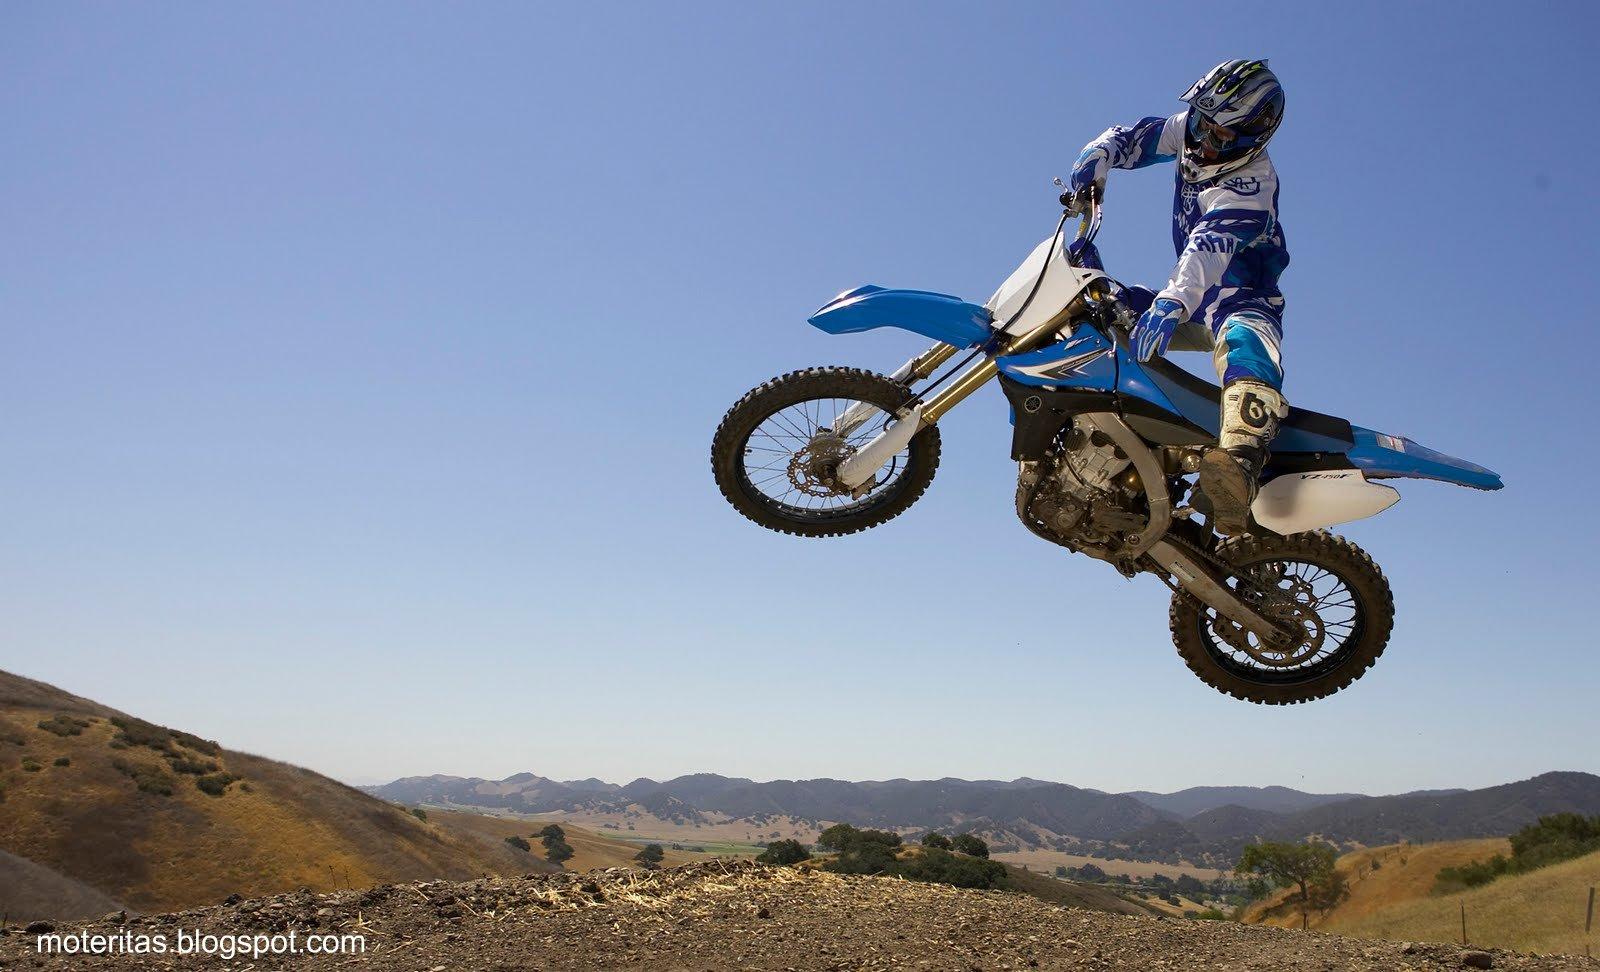 http://4.bp.blogspot.com/-8yN4eDy6xbU/TniTb37CVJI/AAAAAAAAAYs/5F18OmIbrrY/s1600/Yamaha%2BYZ450F-motocross-motos-mujeres-wallpaper%2B848%2B%255Bmoteritas.blogspot.com%255D.jpg